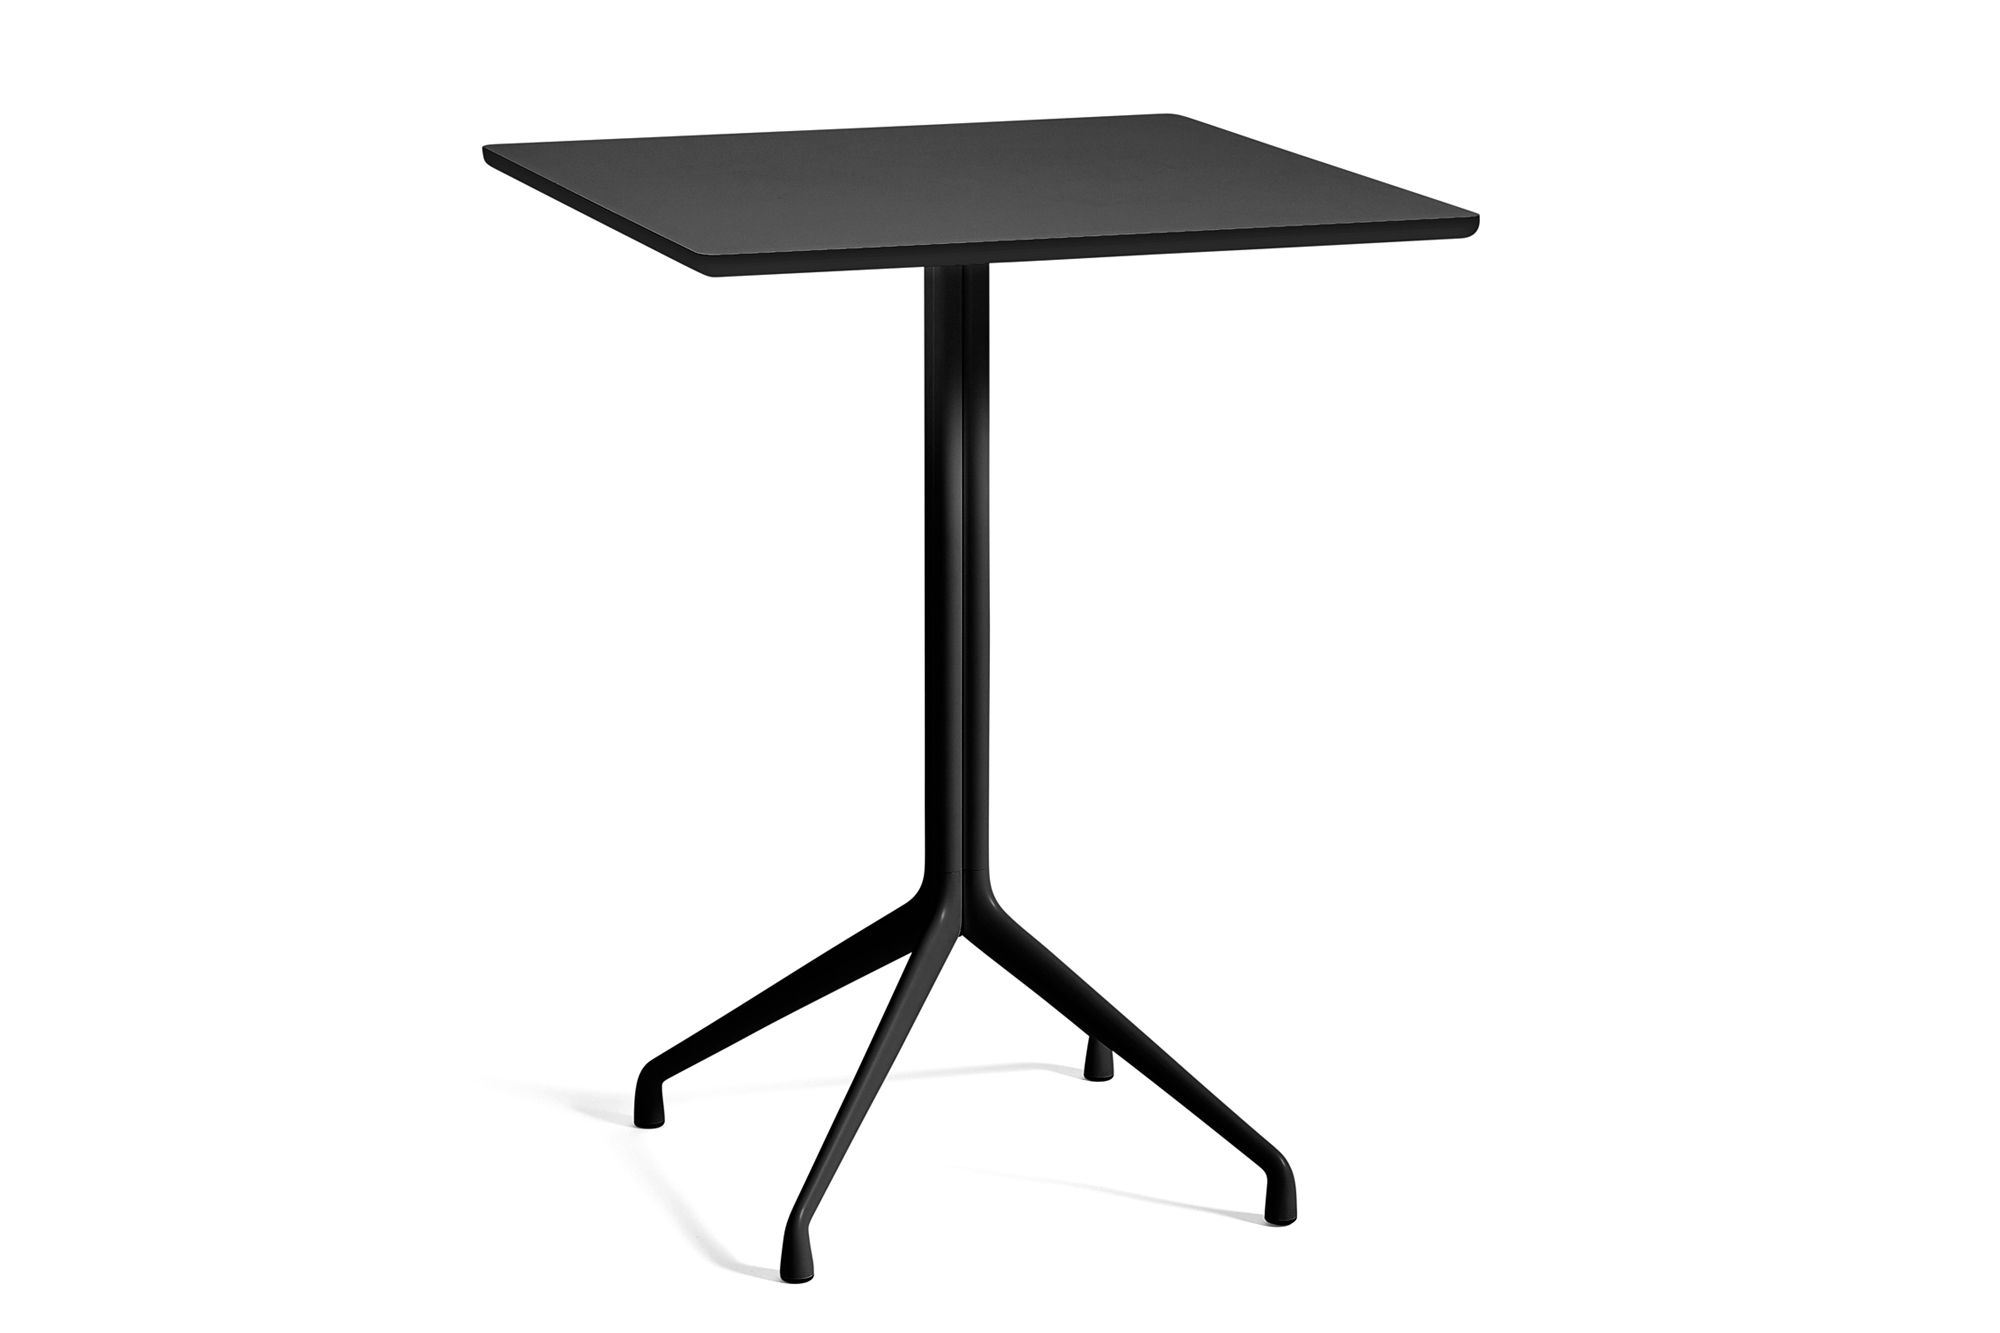 Table d'Appoint Hay AAT15 par Hee Welling